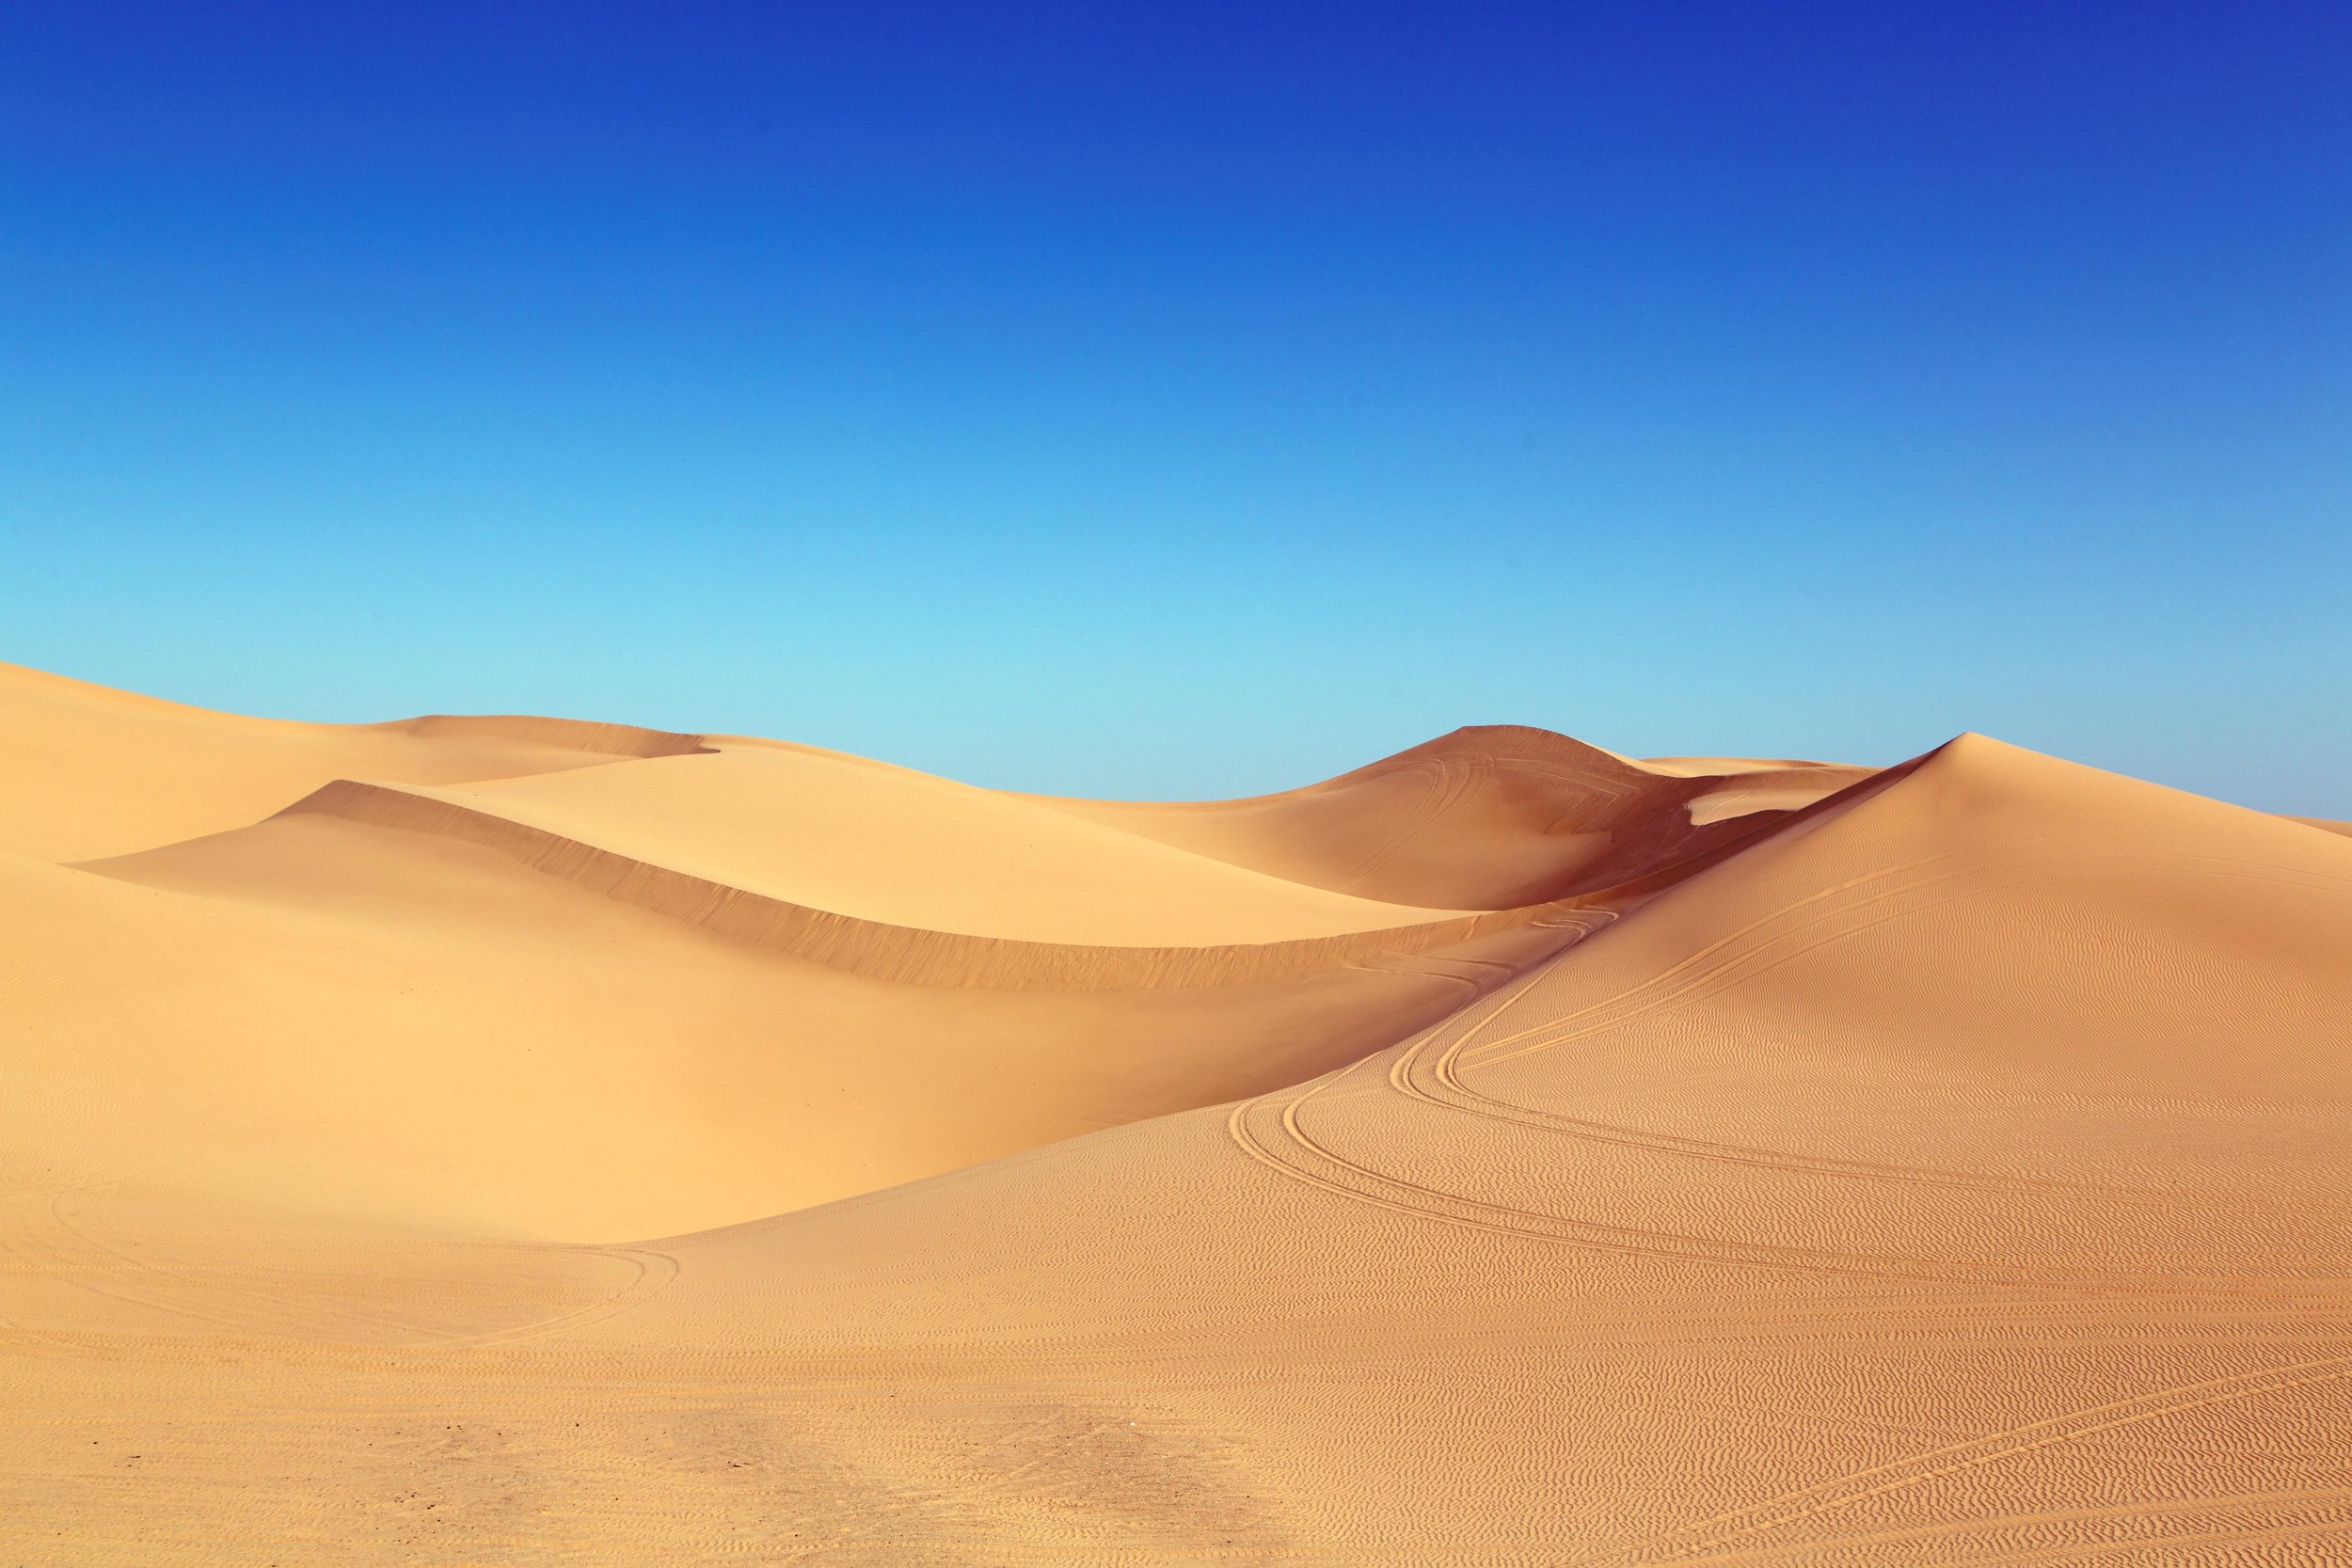 adventure-arid-barren-210307.jpg